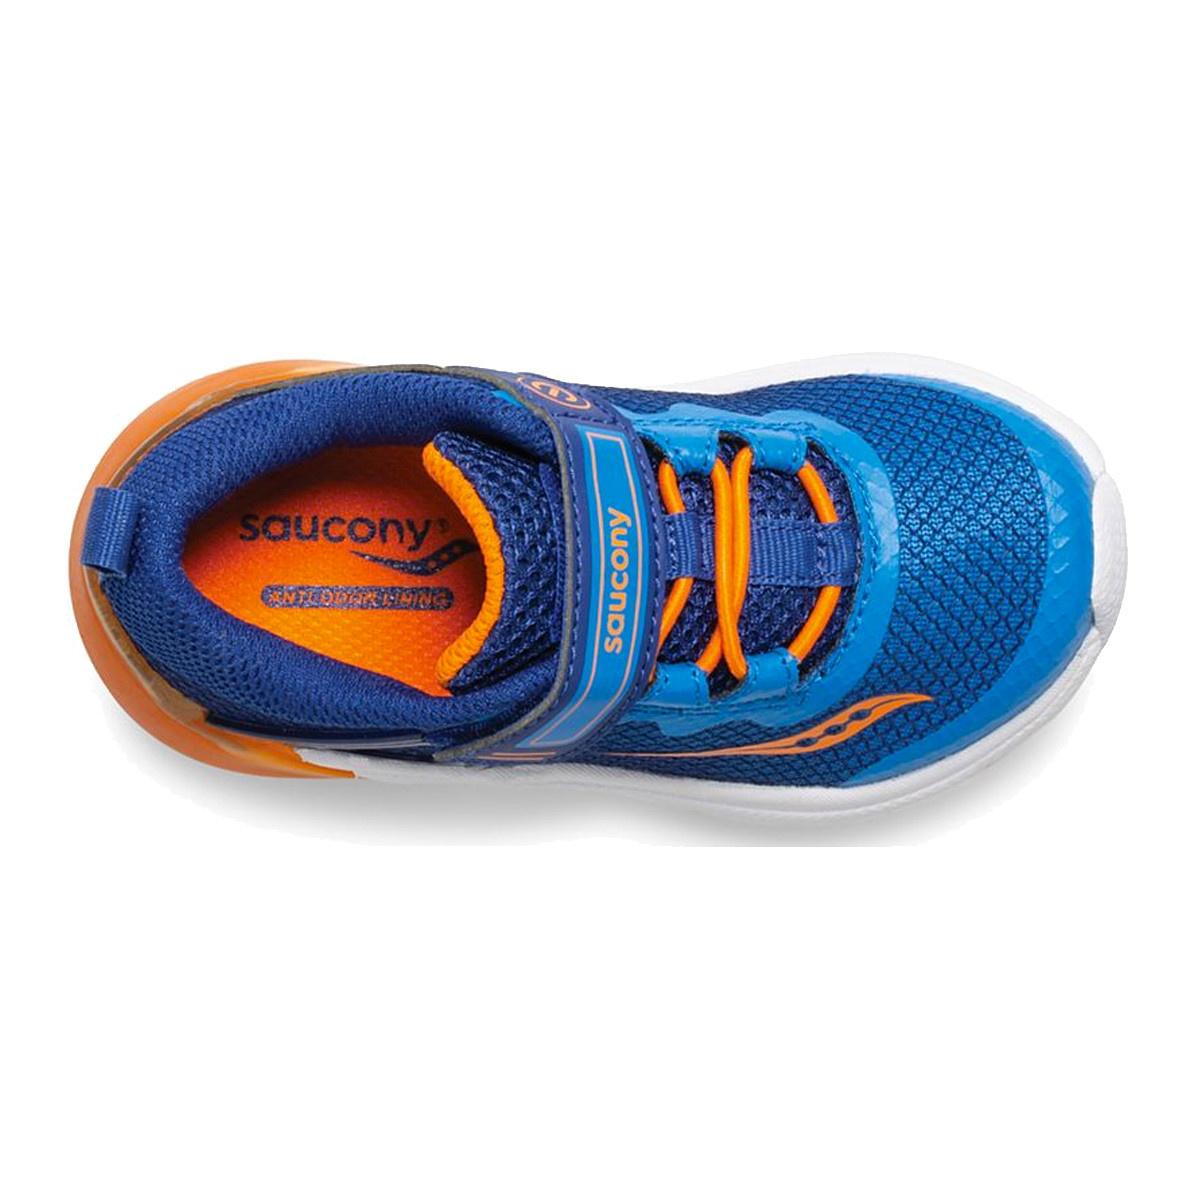 Saucony Saucony Youth Flash Glow Blue/Orange